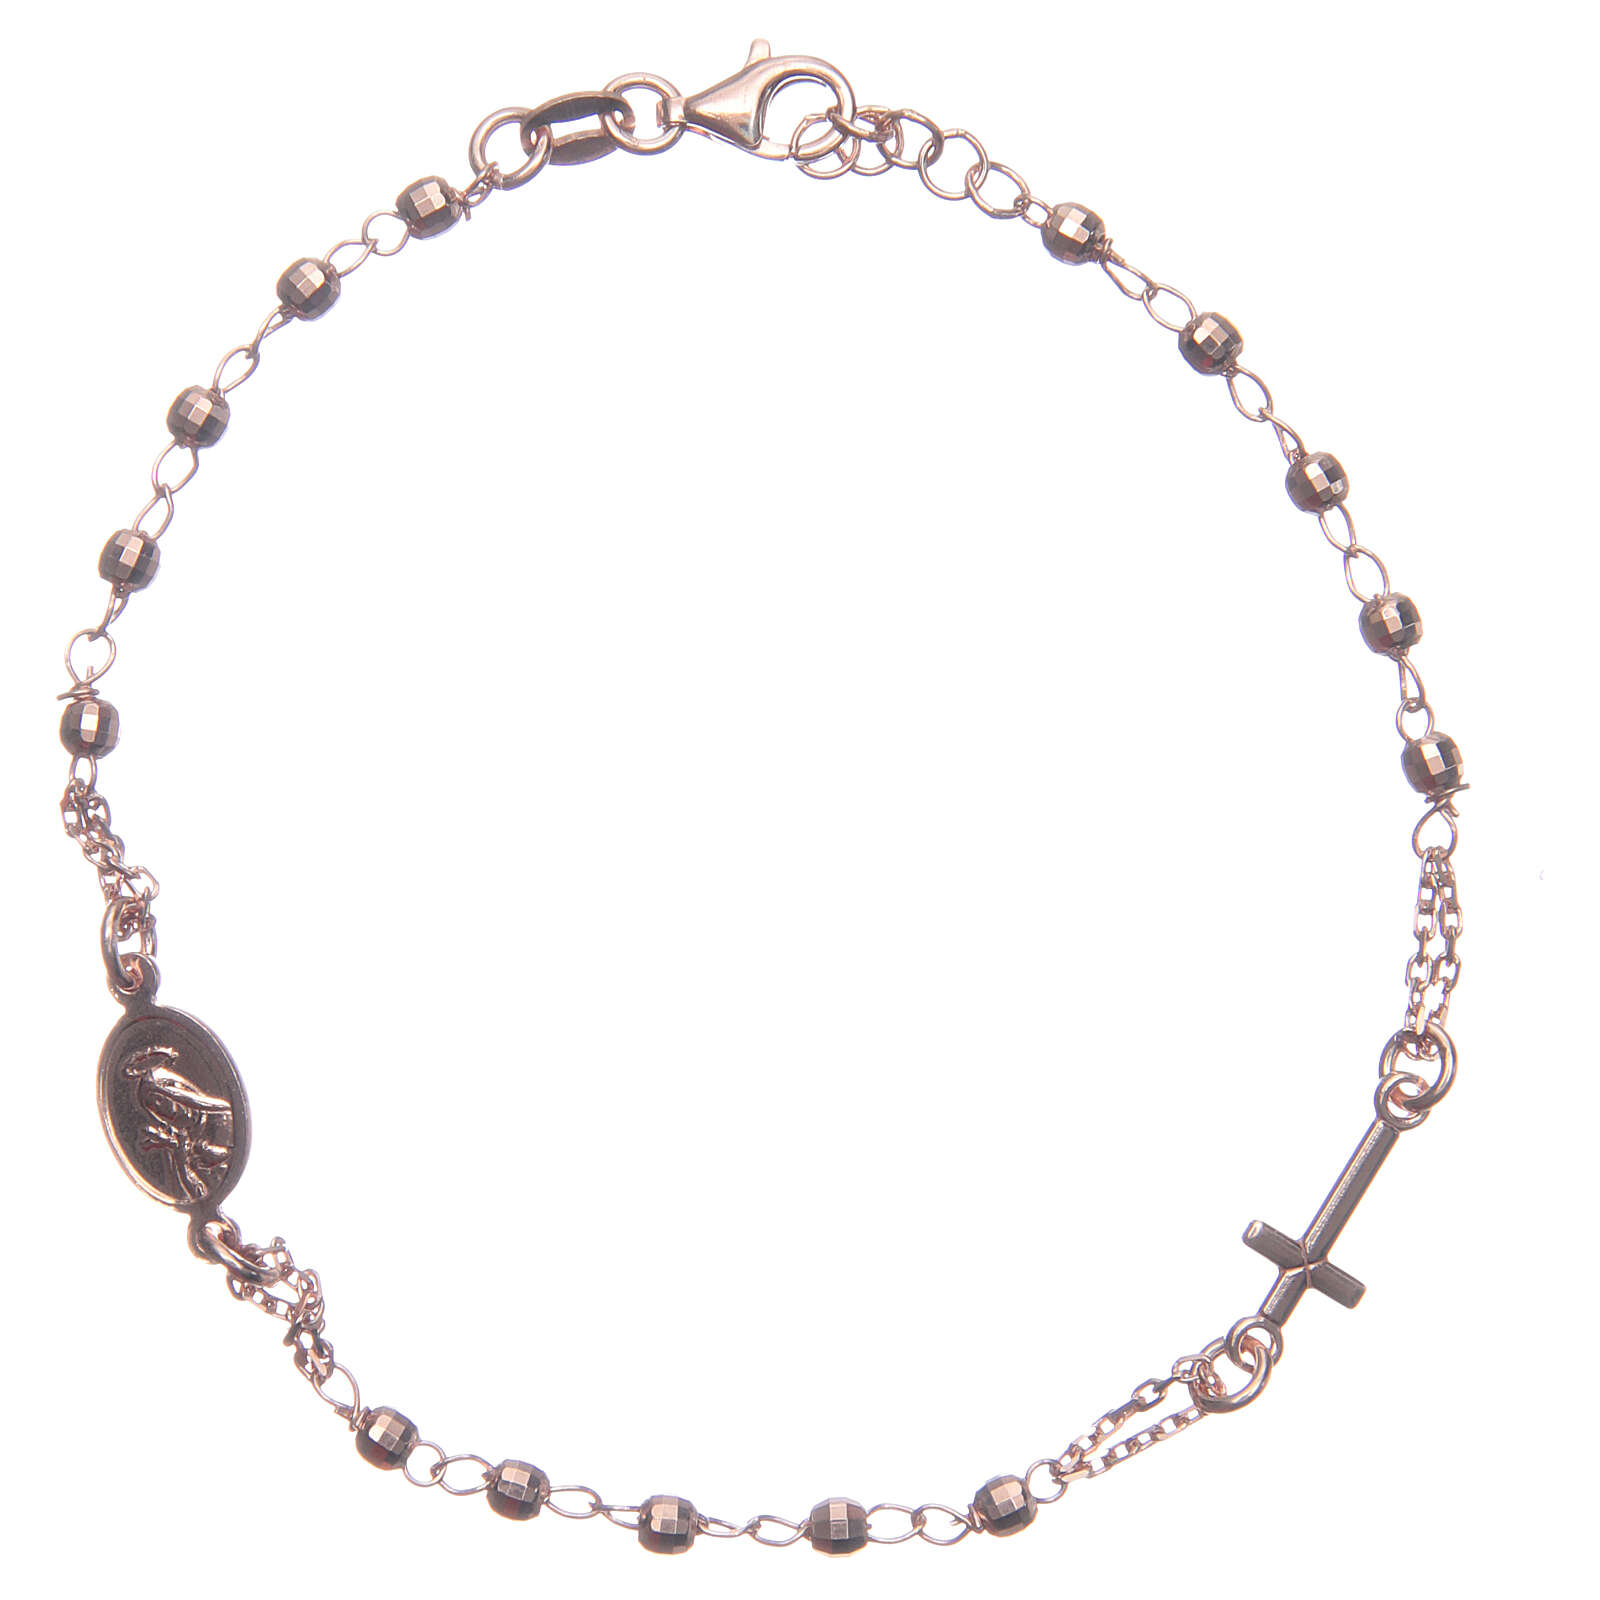 Armband Rosenkranz Santa Rita aus 925er Silber, rosé 4